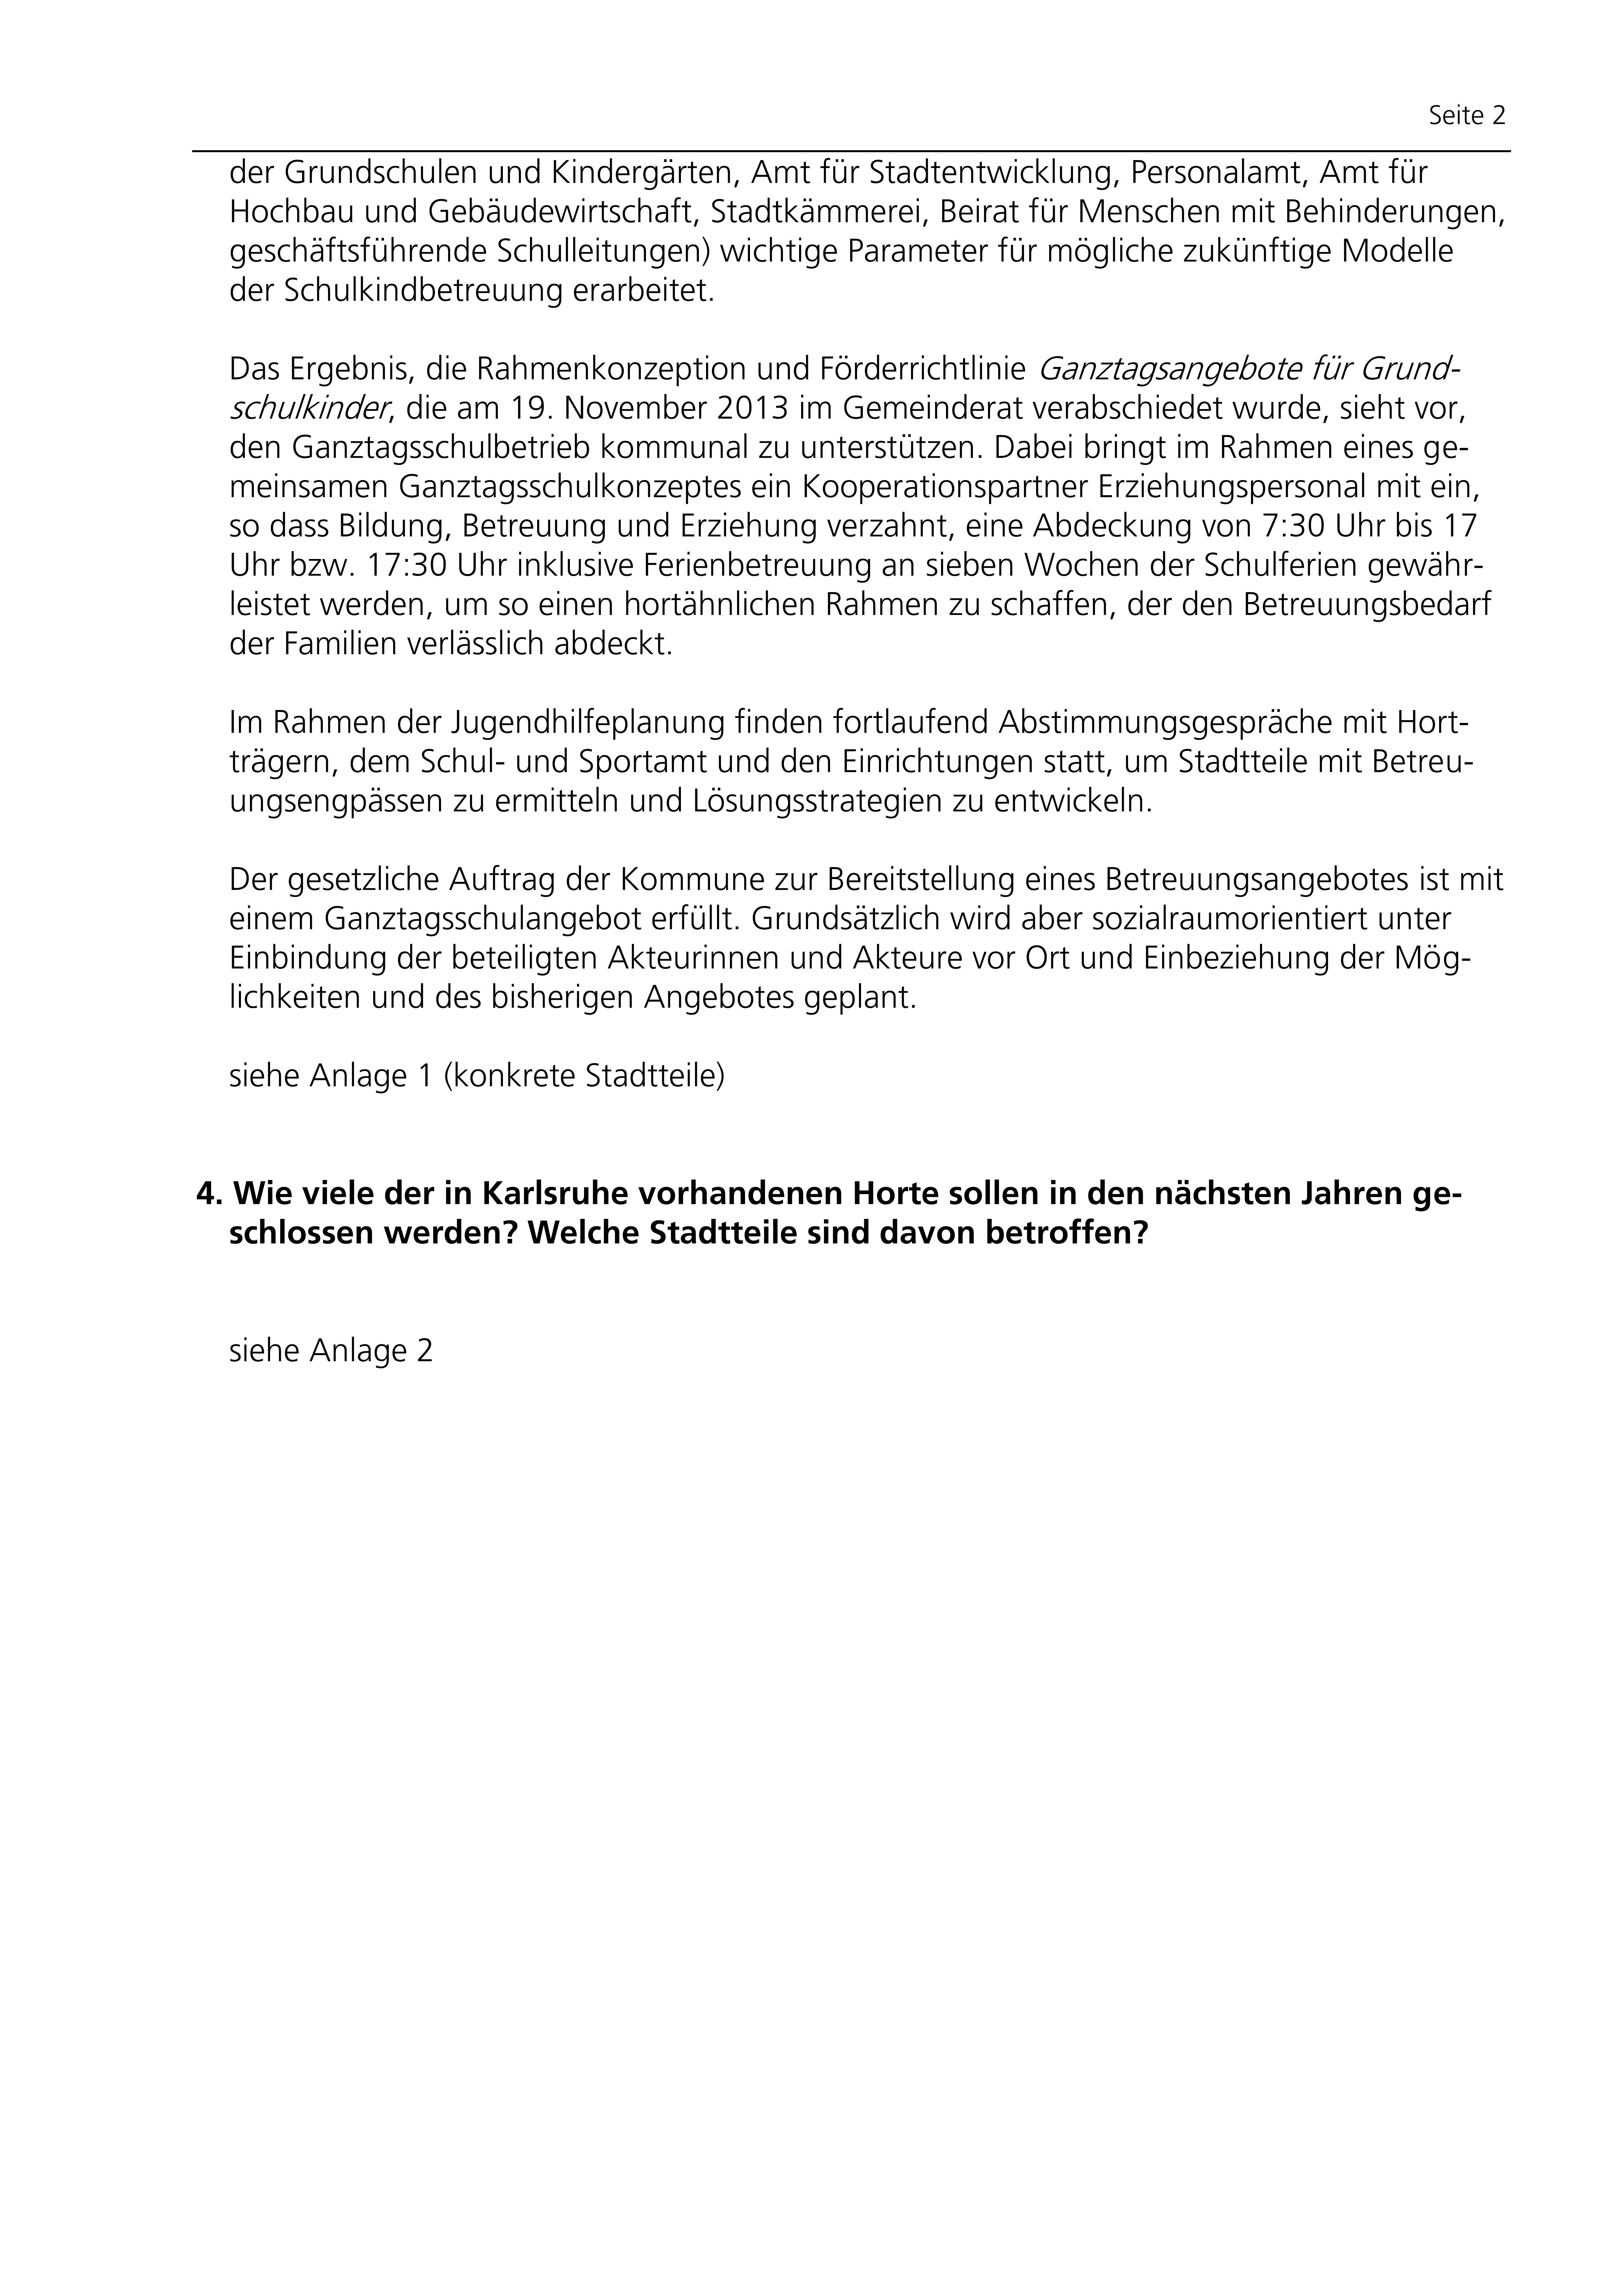 Stellungnahme_TOP_17-Hortsituation_002